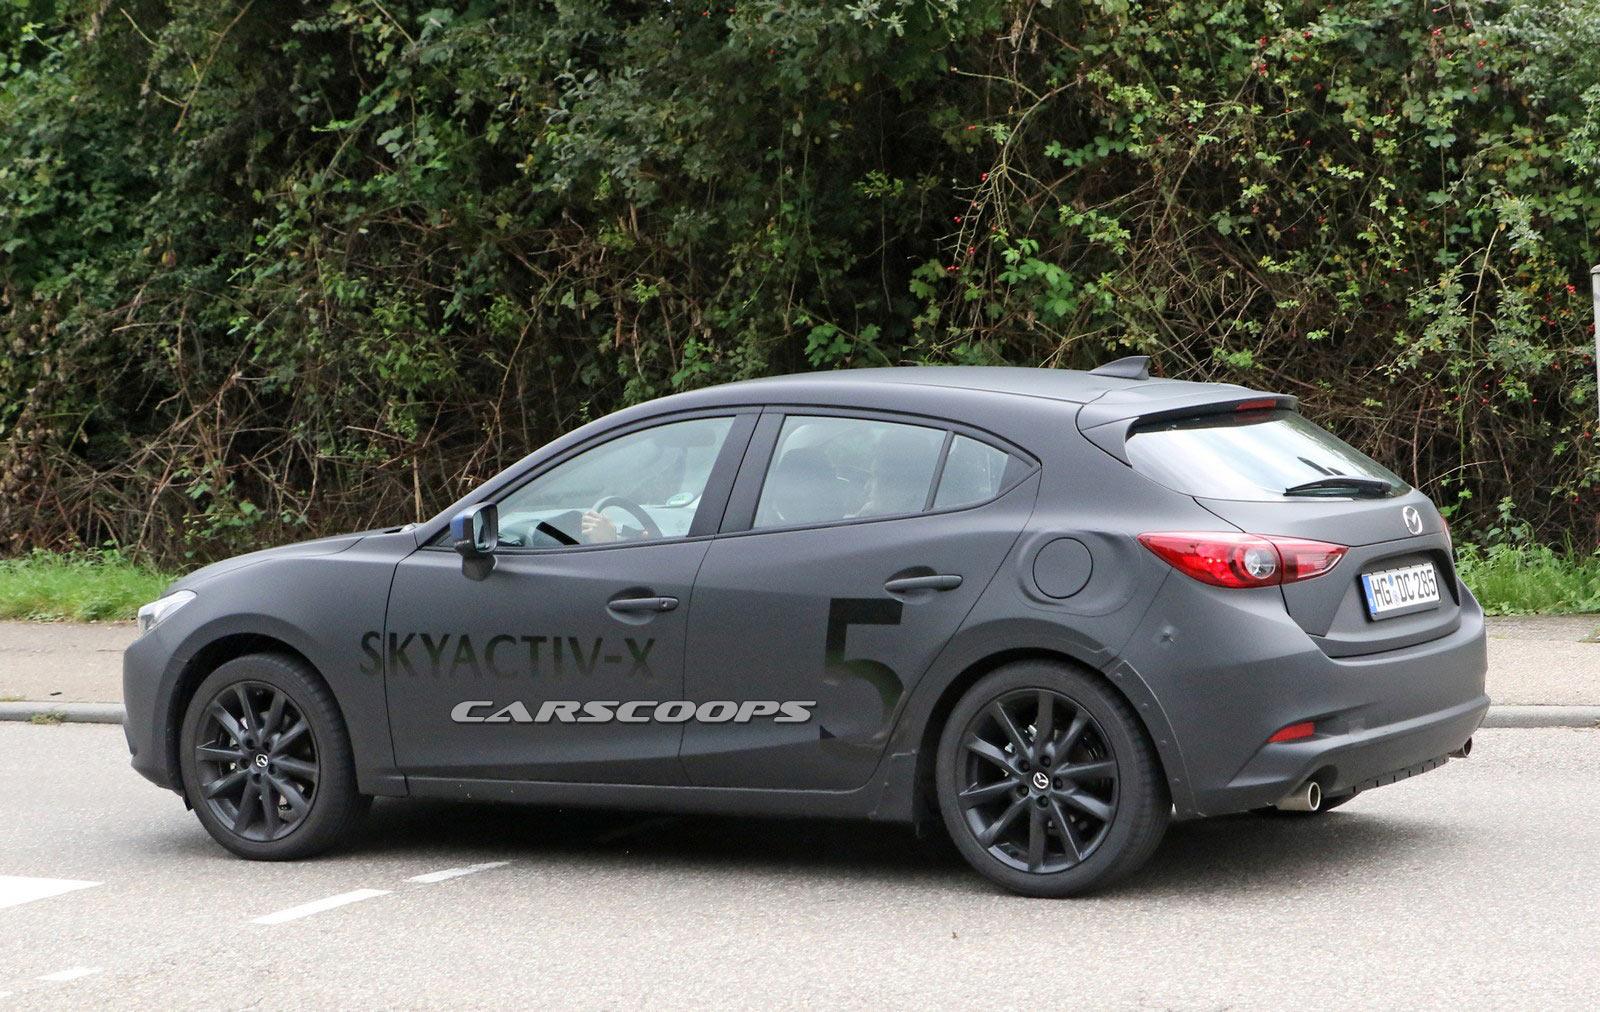 Elantra Interior 2017 >> New Mazda3 Prototype Spied With A Skyactiv-X Engine | Carscoops